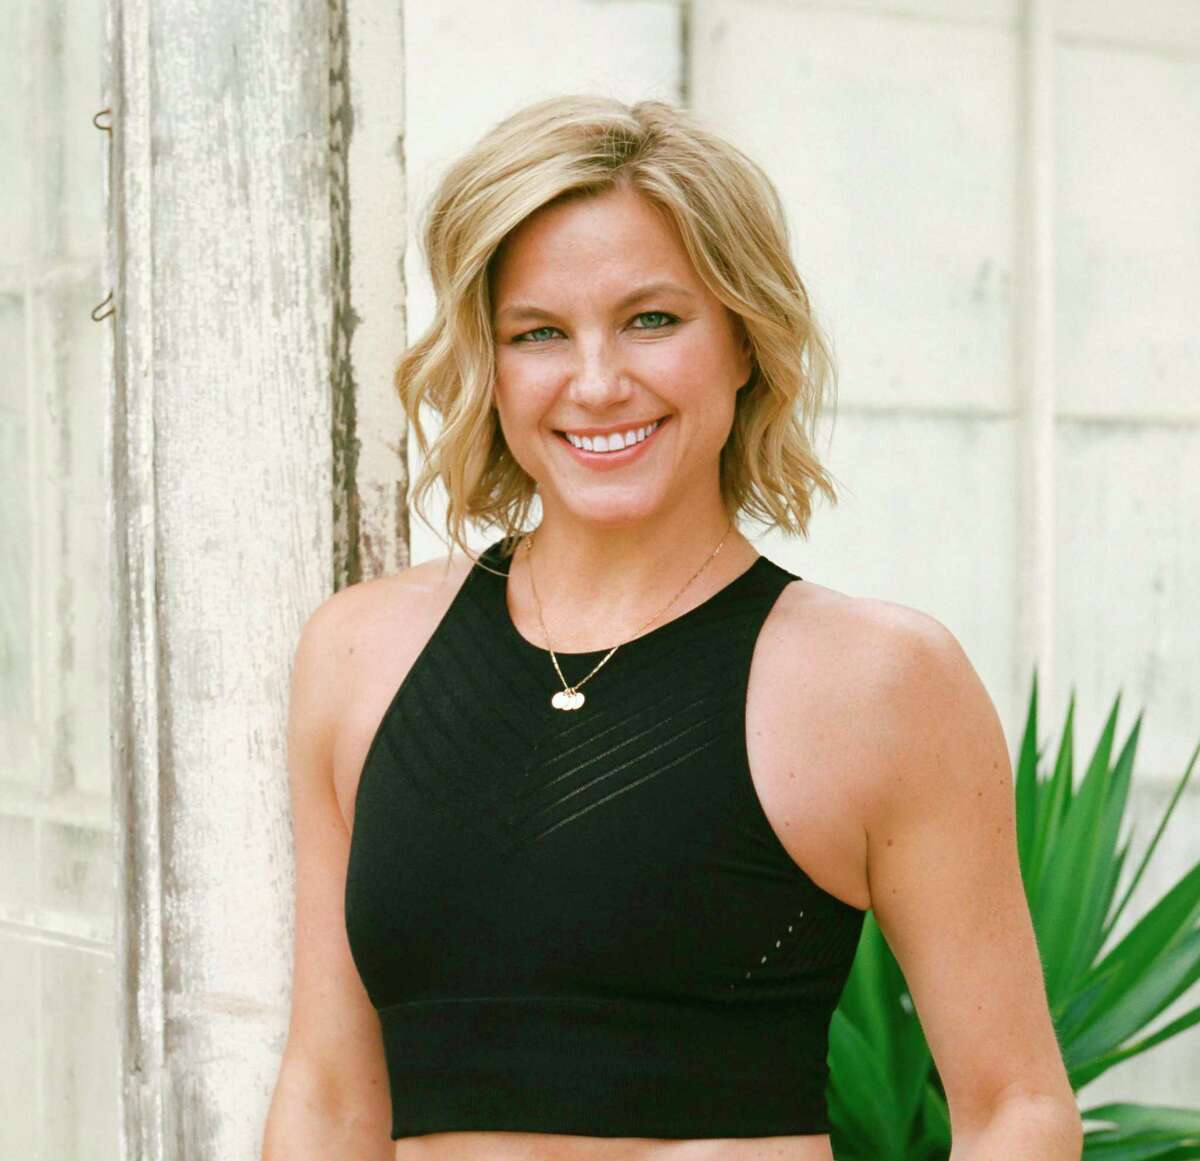 Liz Plosser